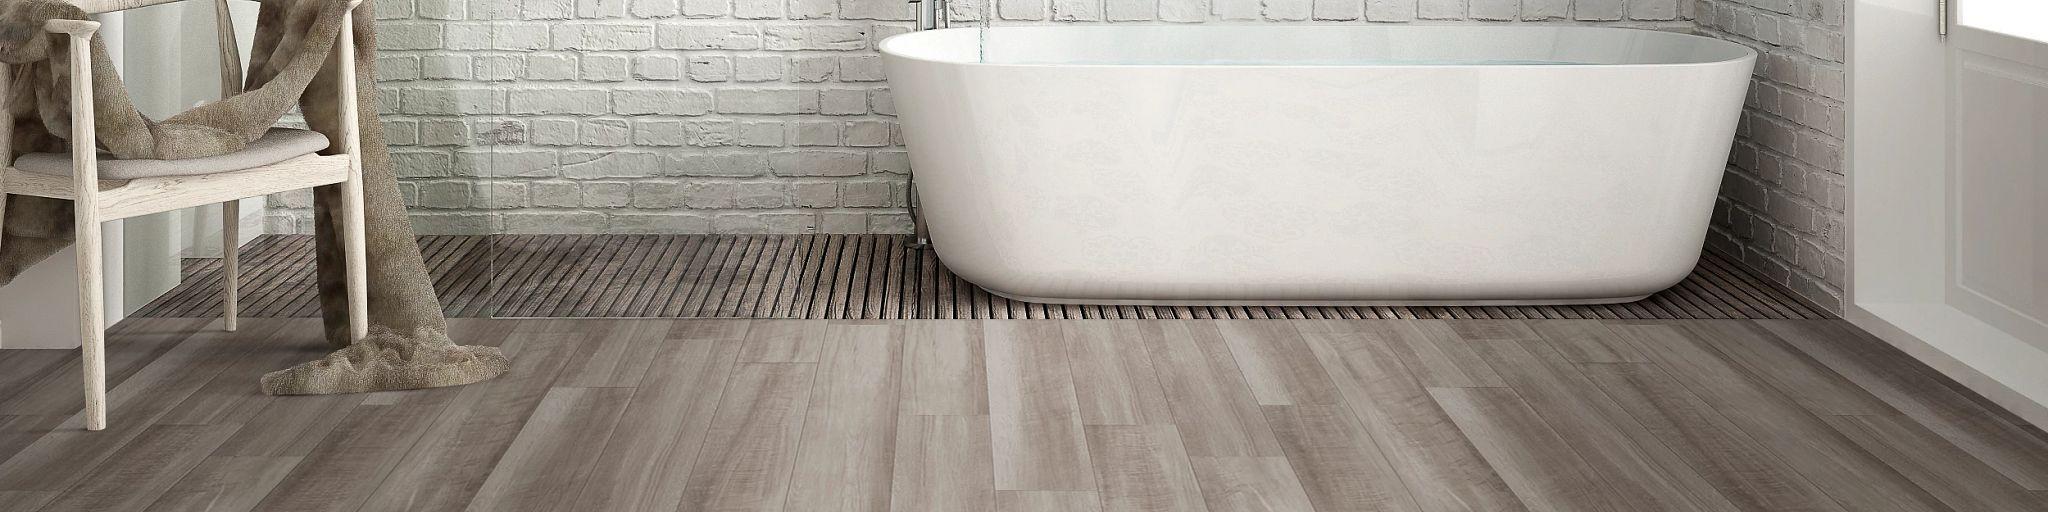 Vinyl-Floorte-Pro-PaladinPlus-0278V-00591-OysterOak-Bathroom-2020